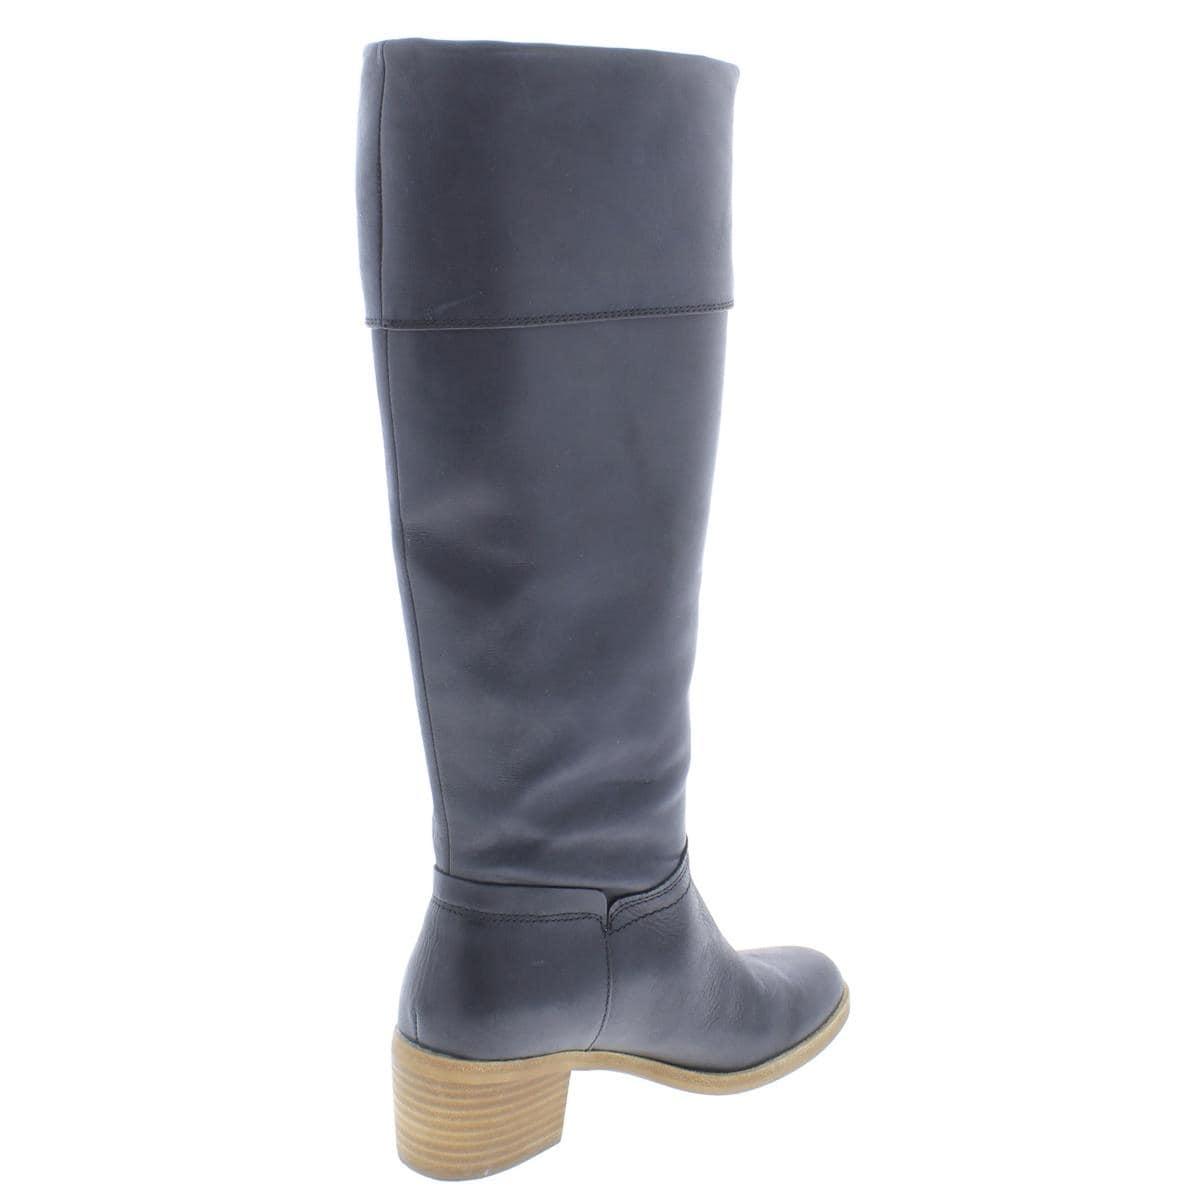 e649e170e98 Shop Ugg Womens Carlin Knee-High Boots Leather Fashion - Free Shipping  Today - Overstock.com - 24254614